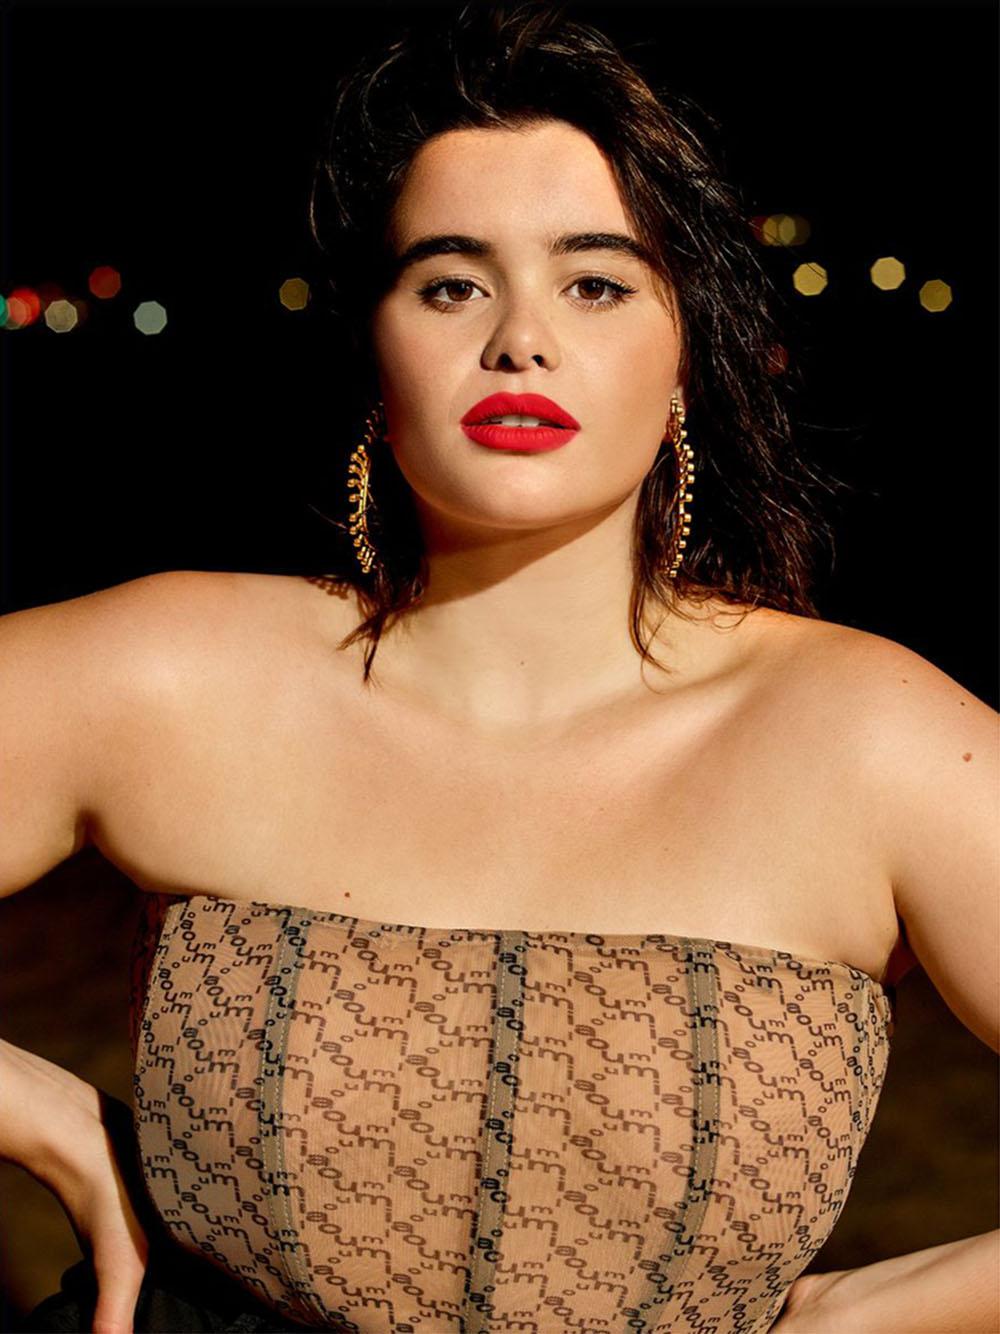 Barbie Ferreira covers Cosmopolitan US November 2020 by Peggy Sirota